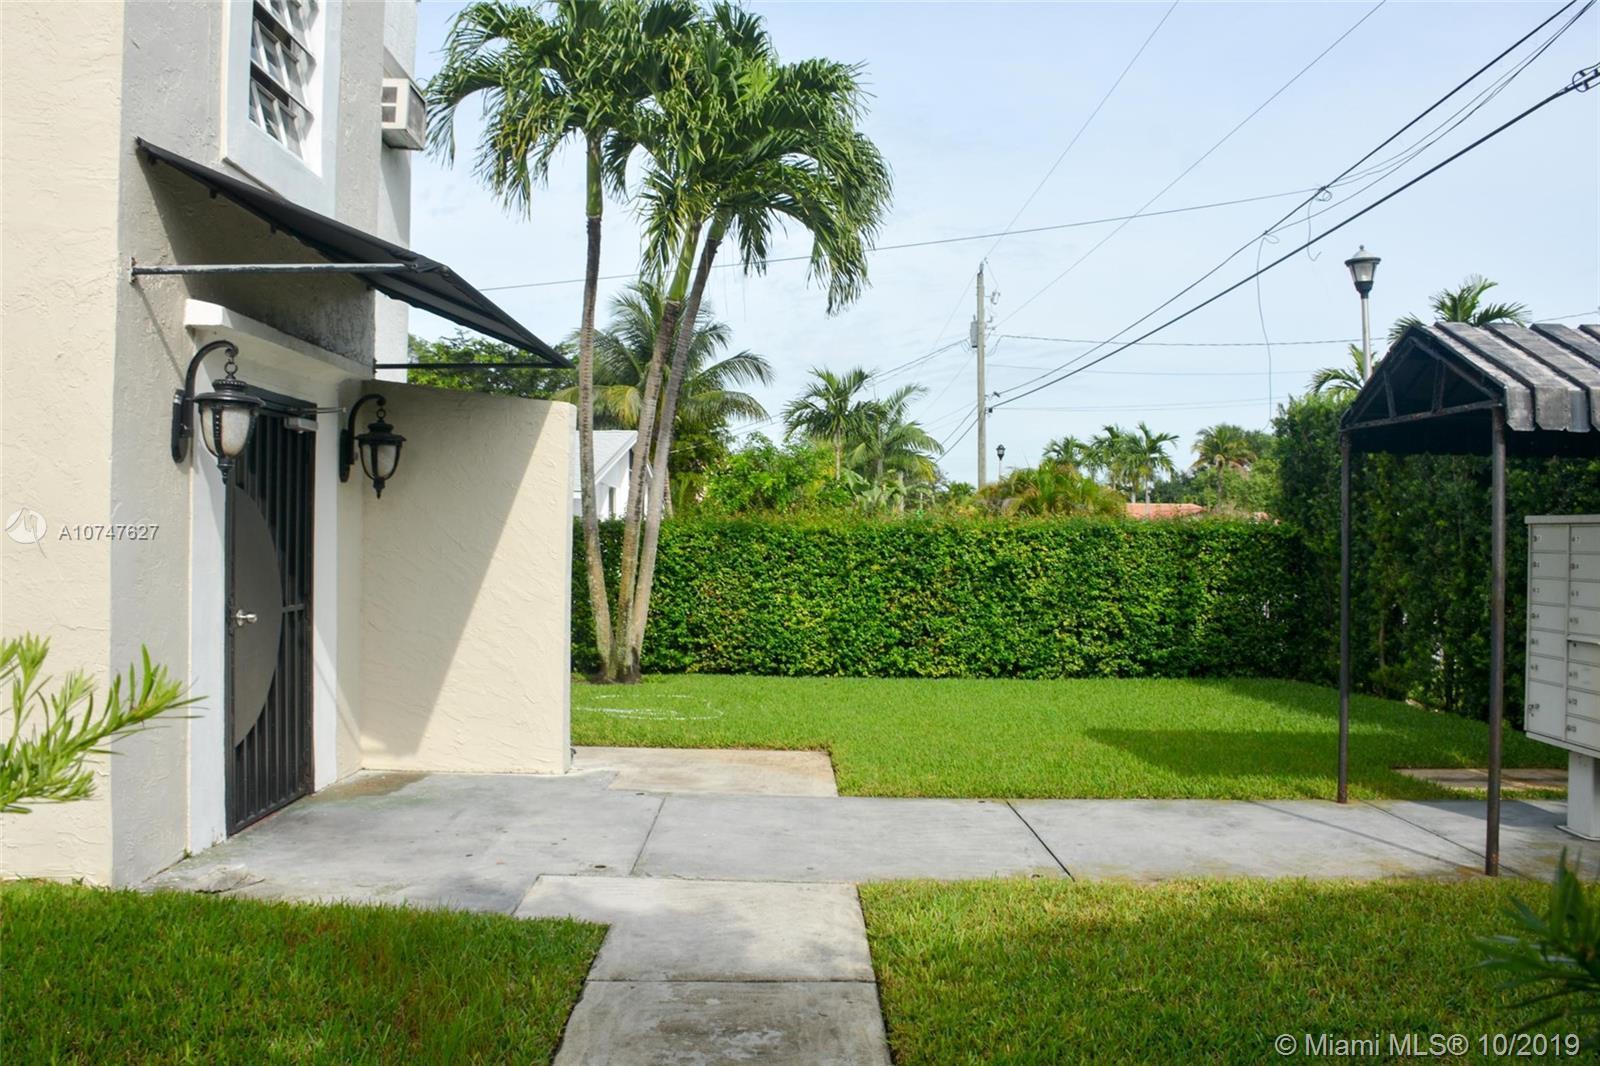 11520 NE 6th Ave, Biscayne Park, FL 33161